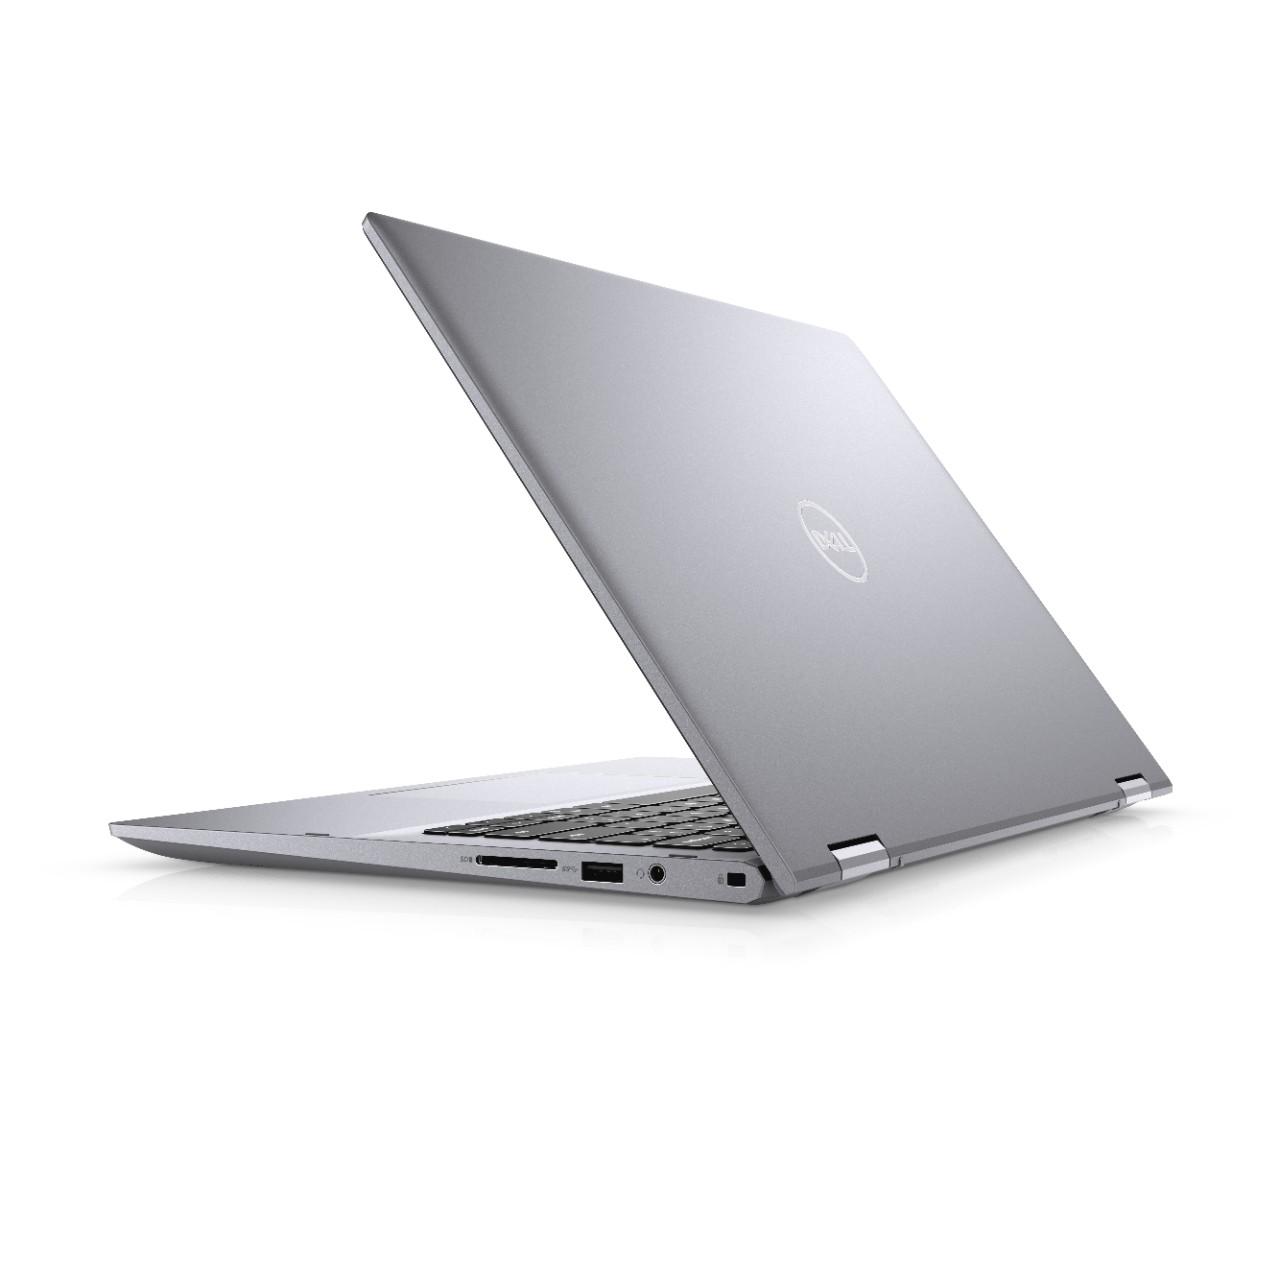 Dell Inspiron 5406 14'' FHD 2v1 Touch i5-1135G7/8GB/512GB/MX330/FPR/HDMI/USB-C/W10Pro/3RNBD/Stříbrný - 5406-24855